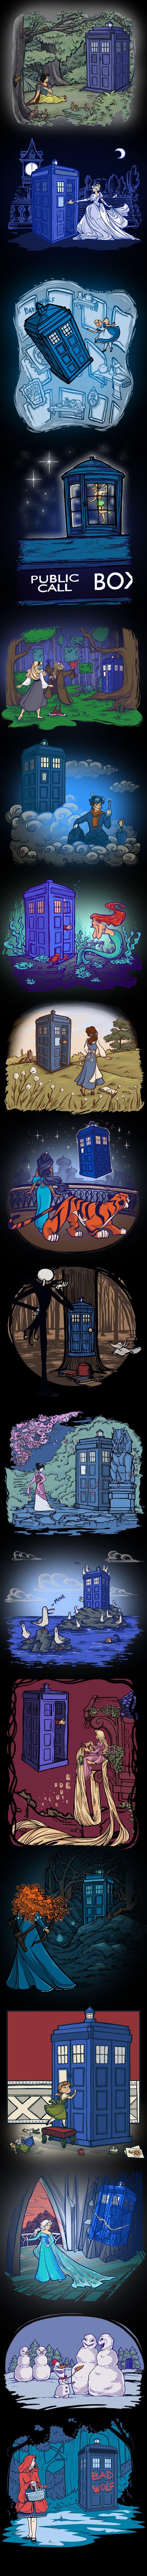 Karen Hallion Disney Doctor Who mashups on TeeFury I need all of these